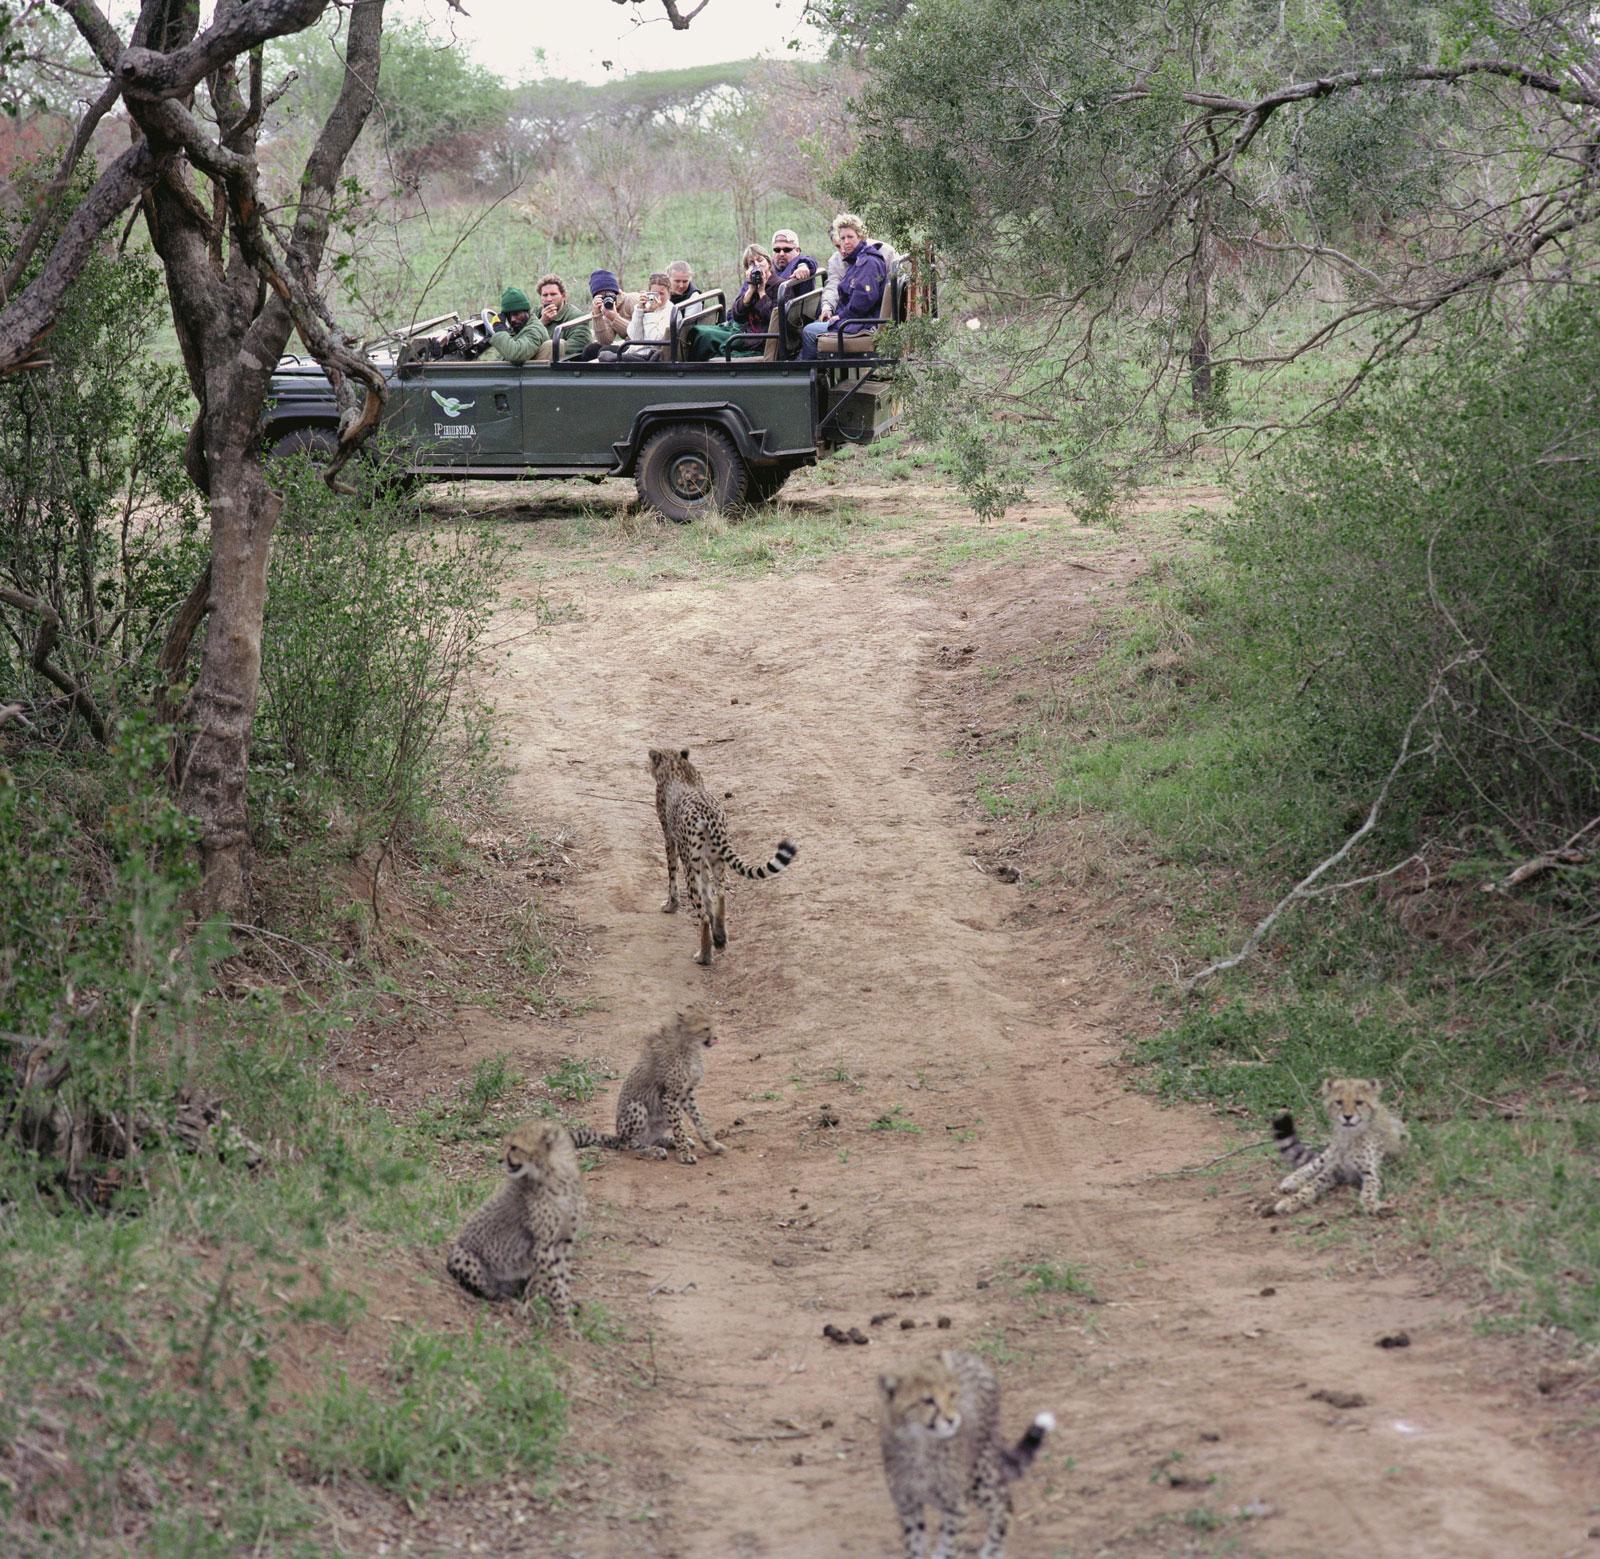 33110e04f087 The Political Economy of Safari | by Rachel Aspden | NYR Daily | The ...